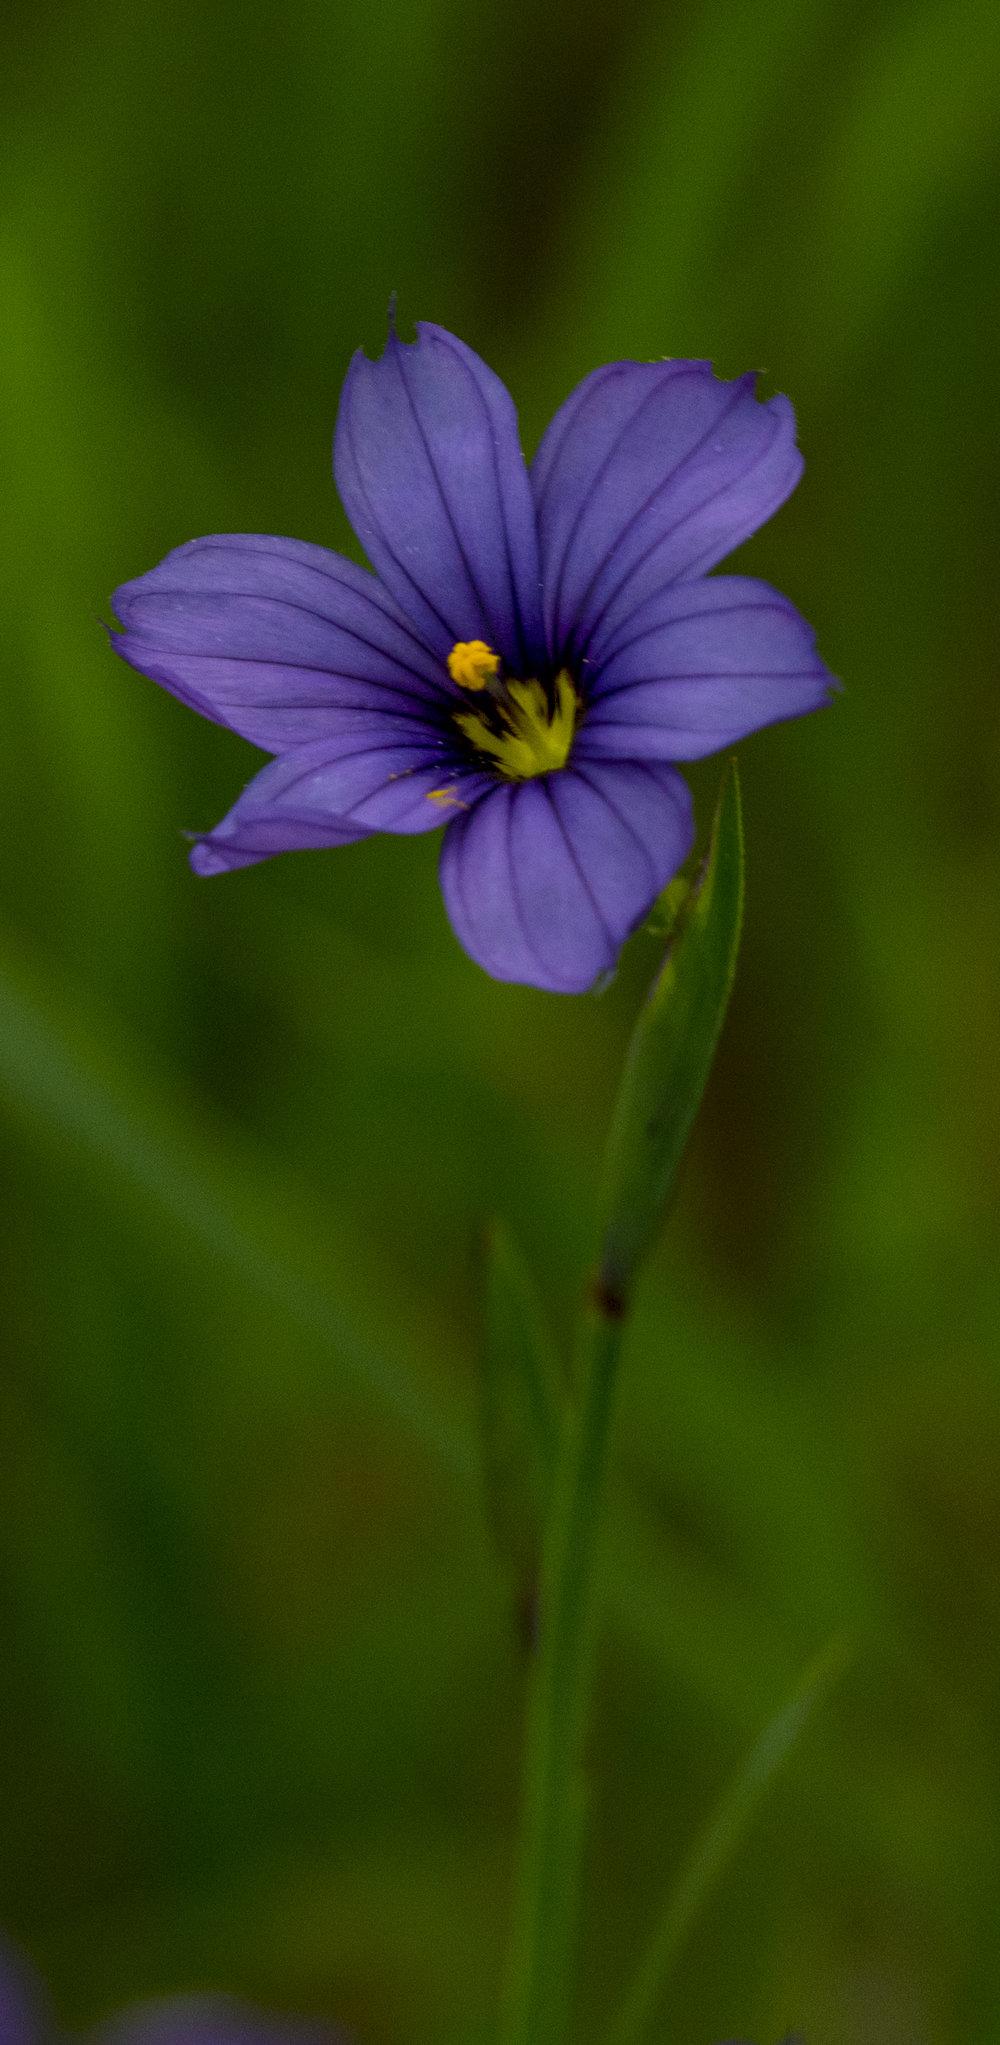 Blue Eyed Grass, Wildflower at Santa Teresa County Park, San Jose, California